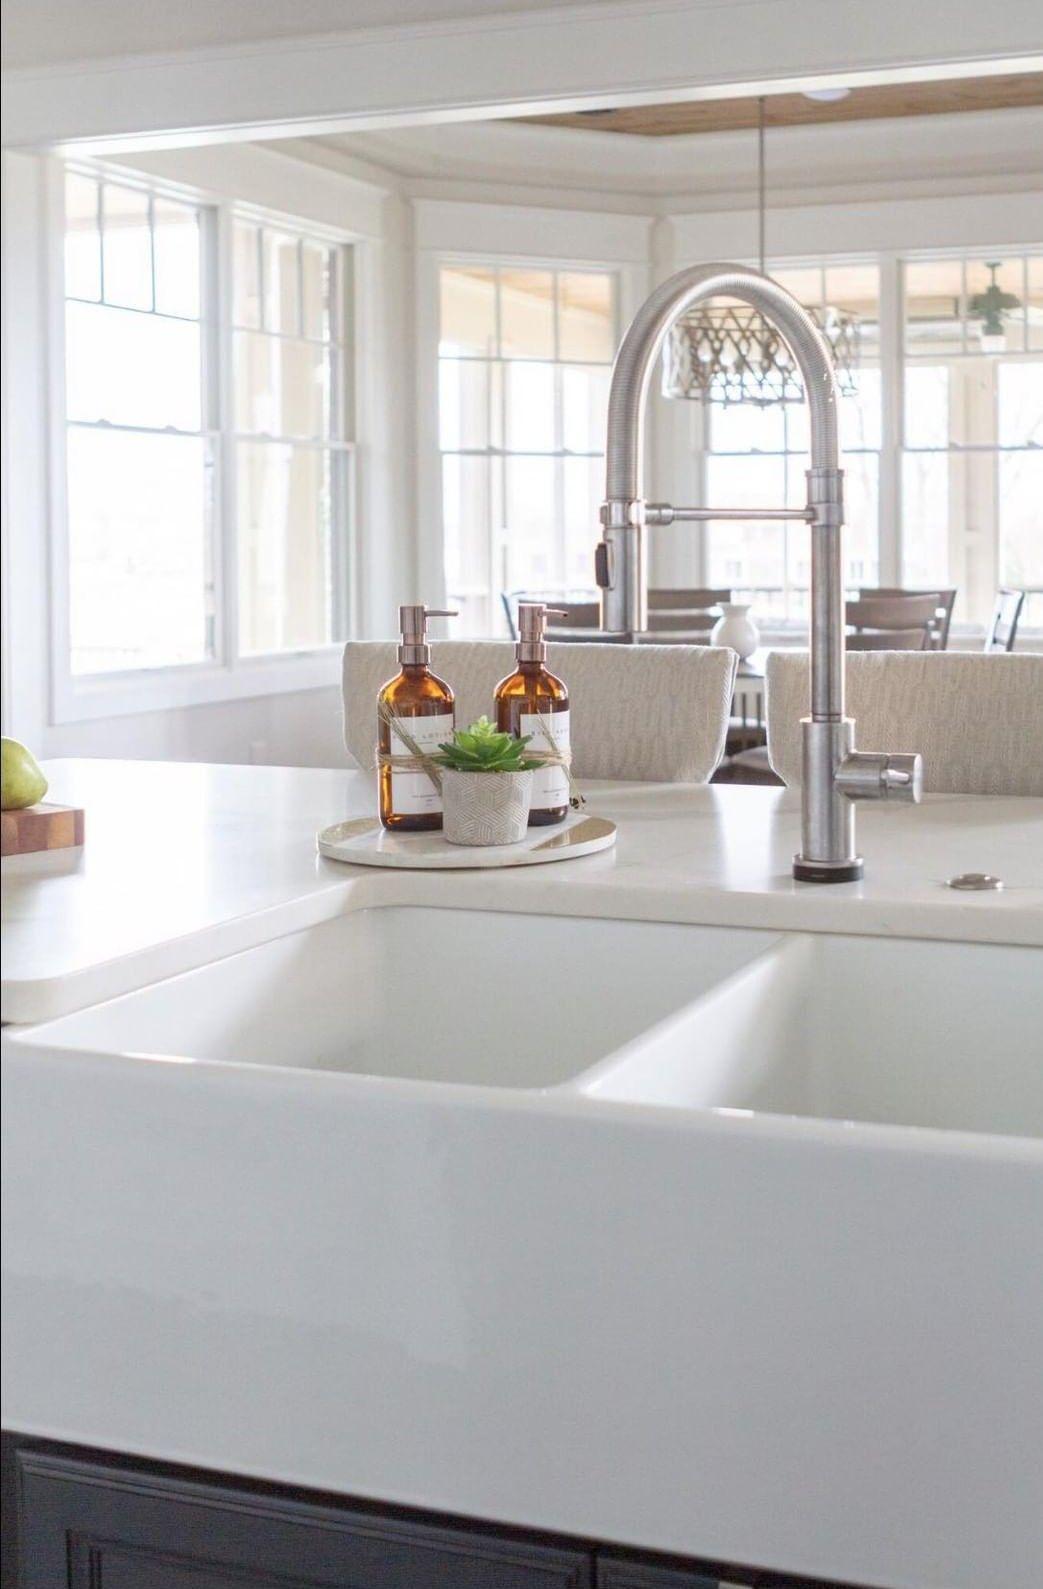 Amber Glass Soap Dispenser Bottles Kitchen Sink Decor Kitchen Renovation Design Kitchen Counter Decor